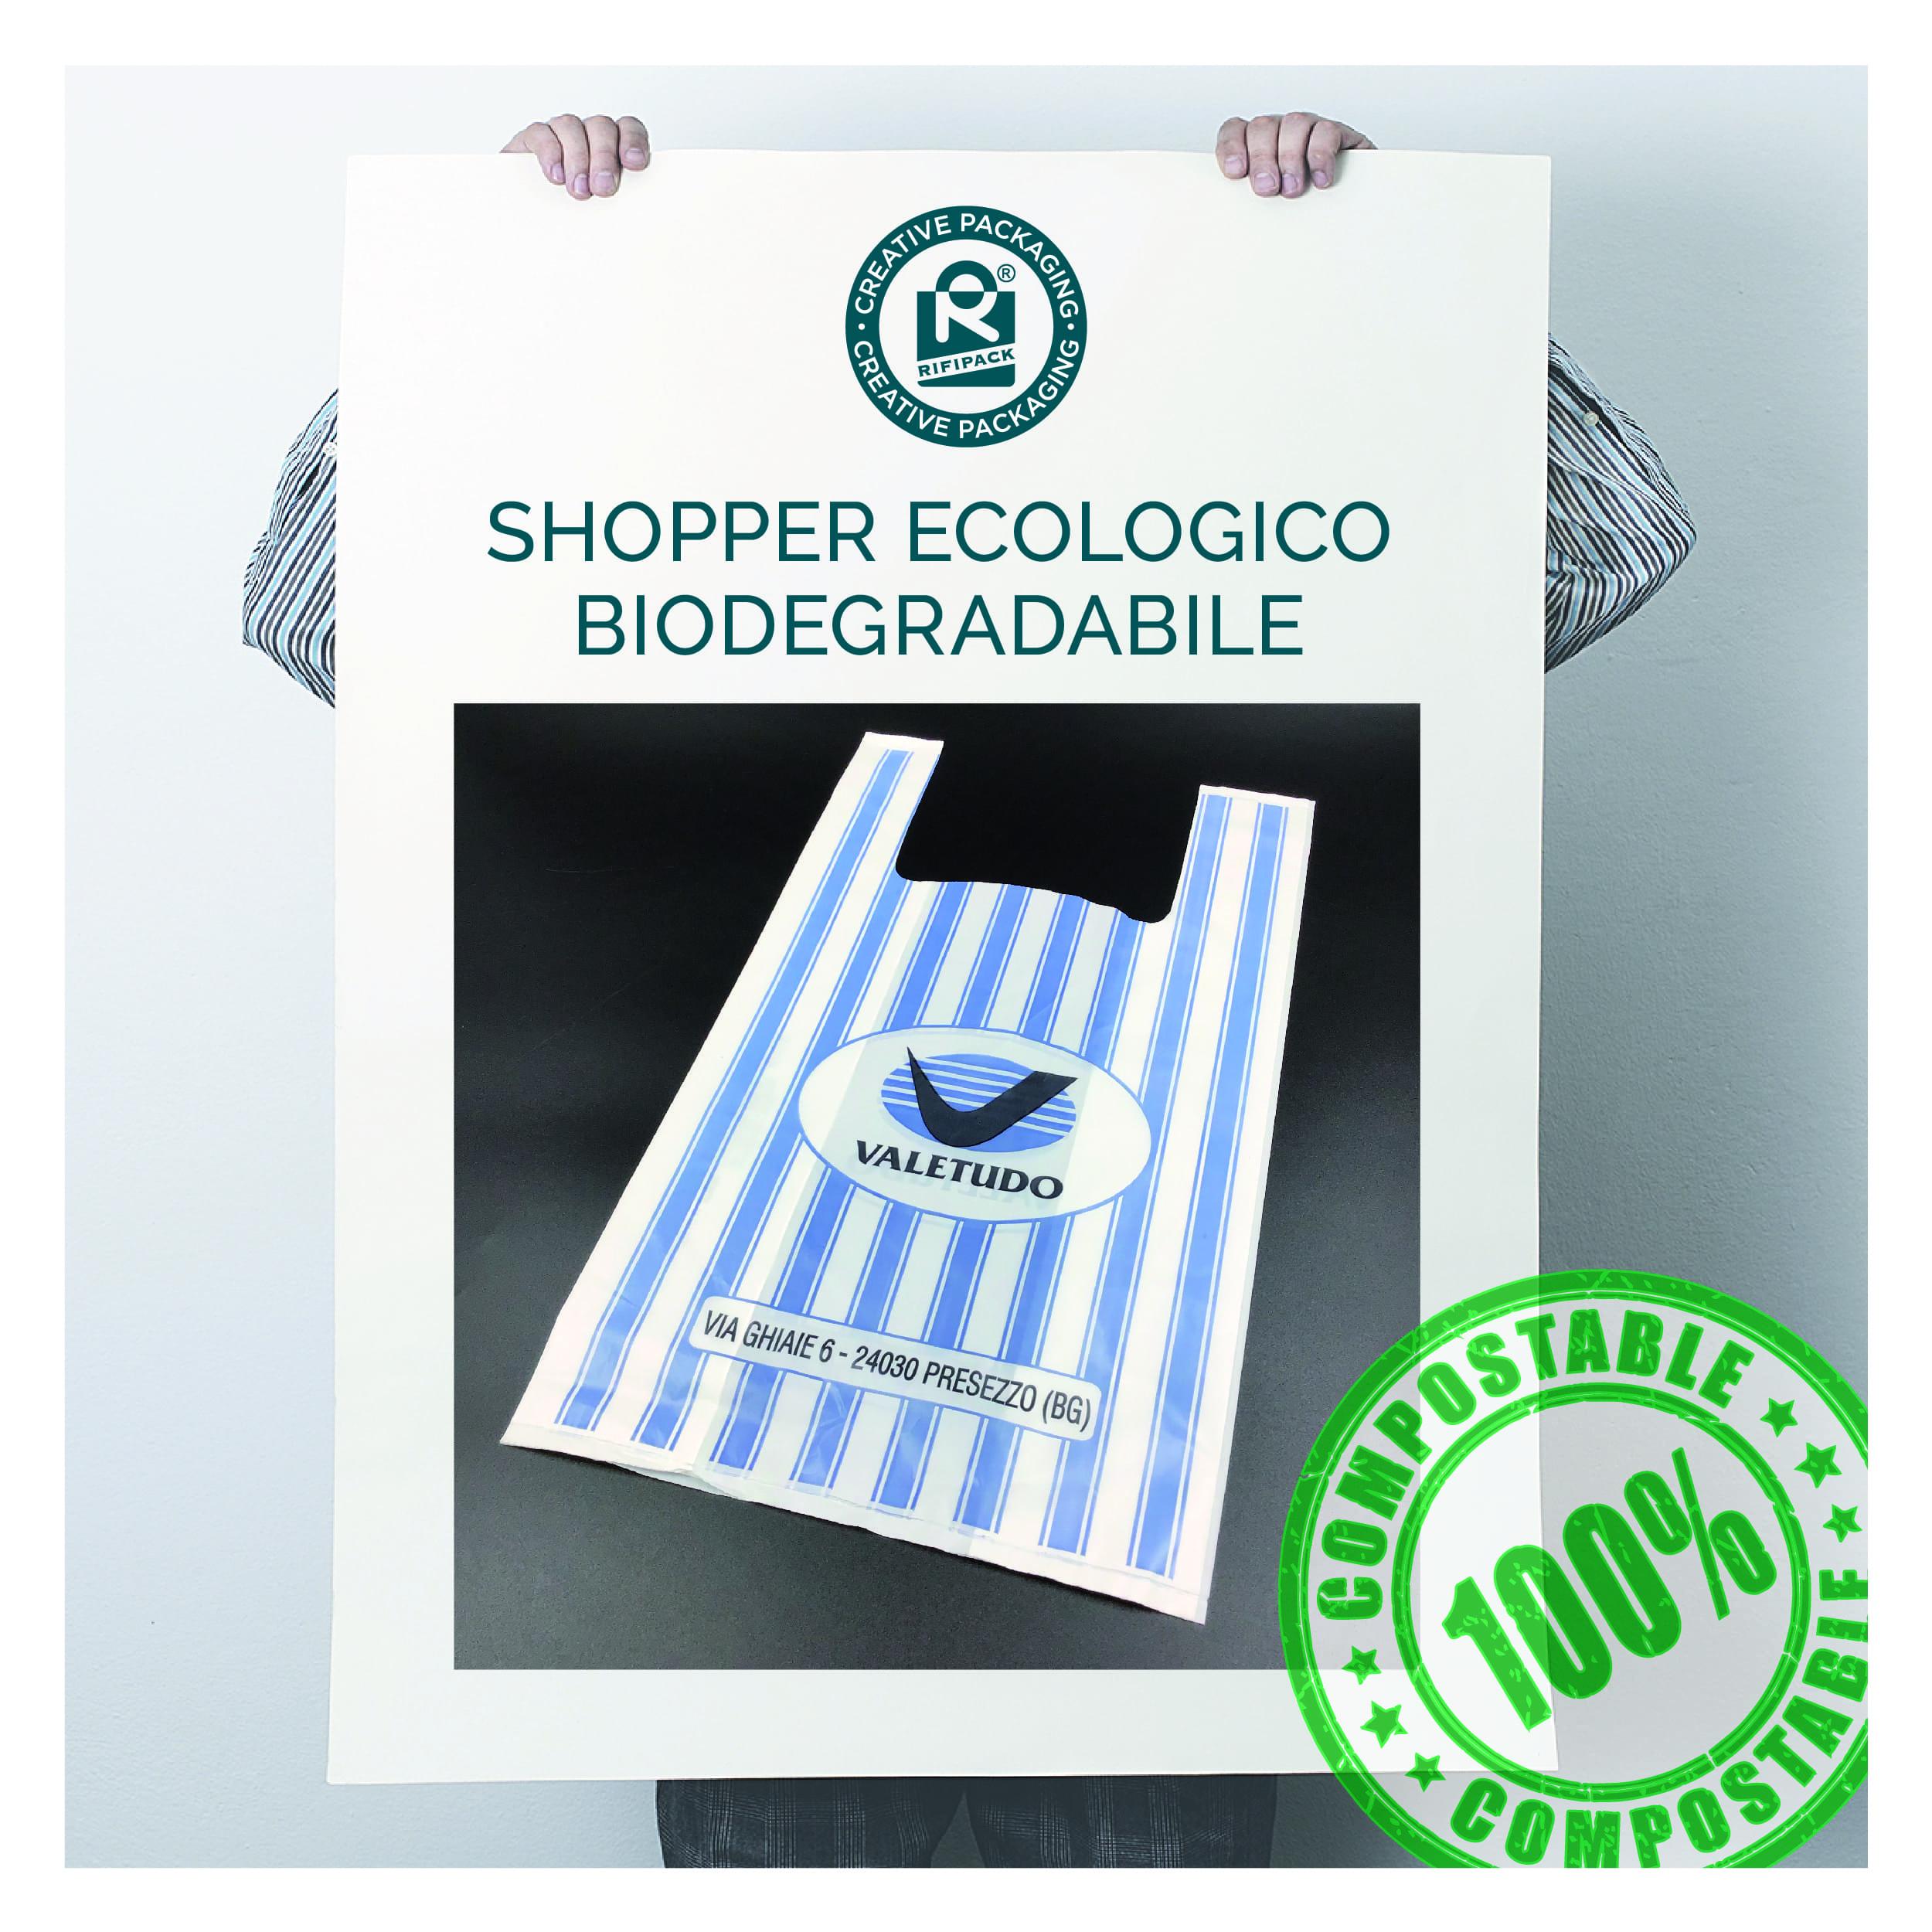 rifipack shopper ecologico biodegradabile compostabile